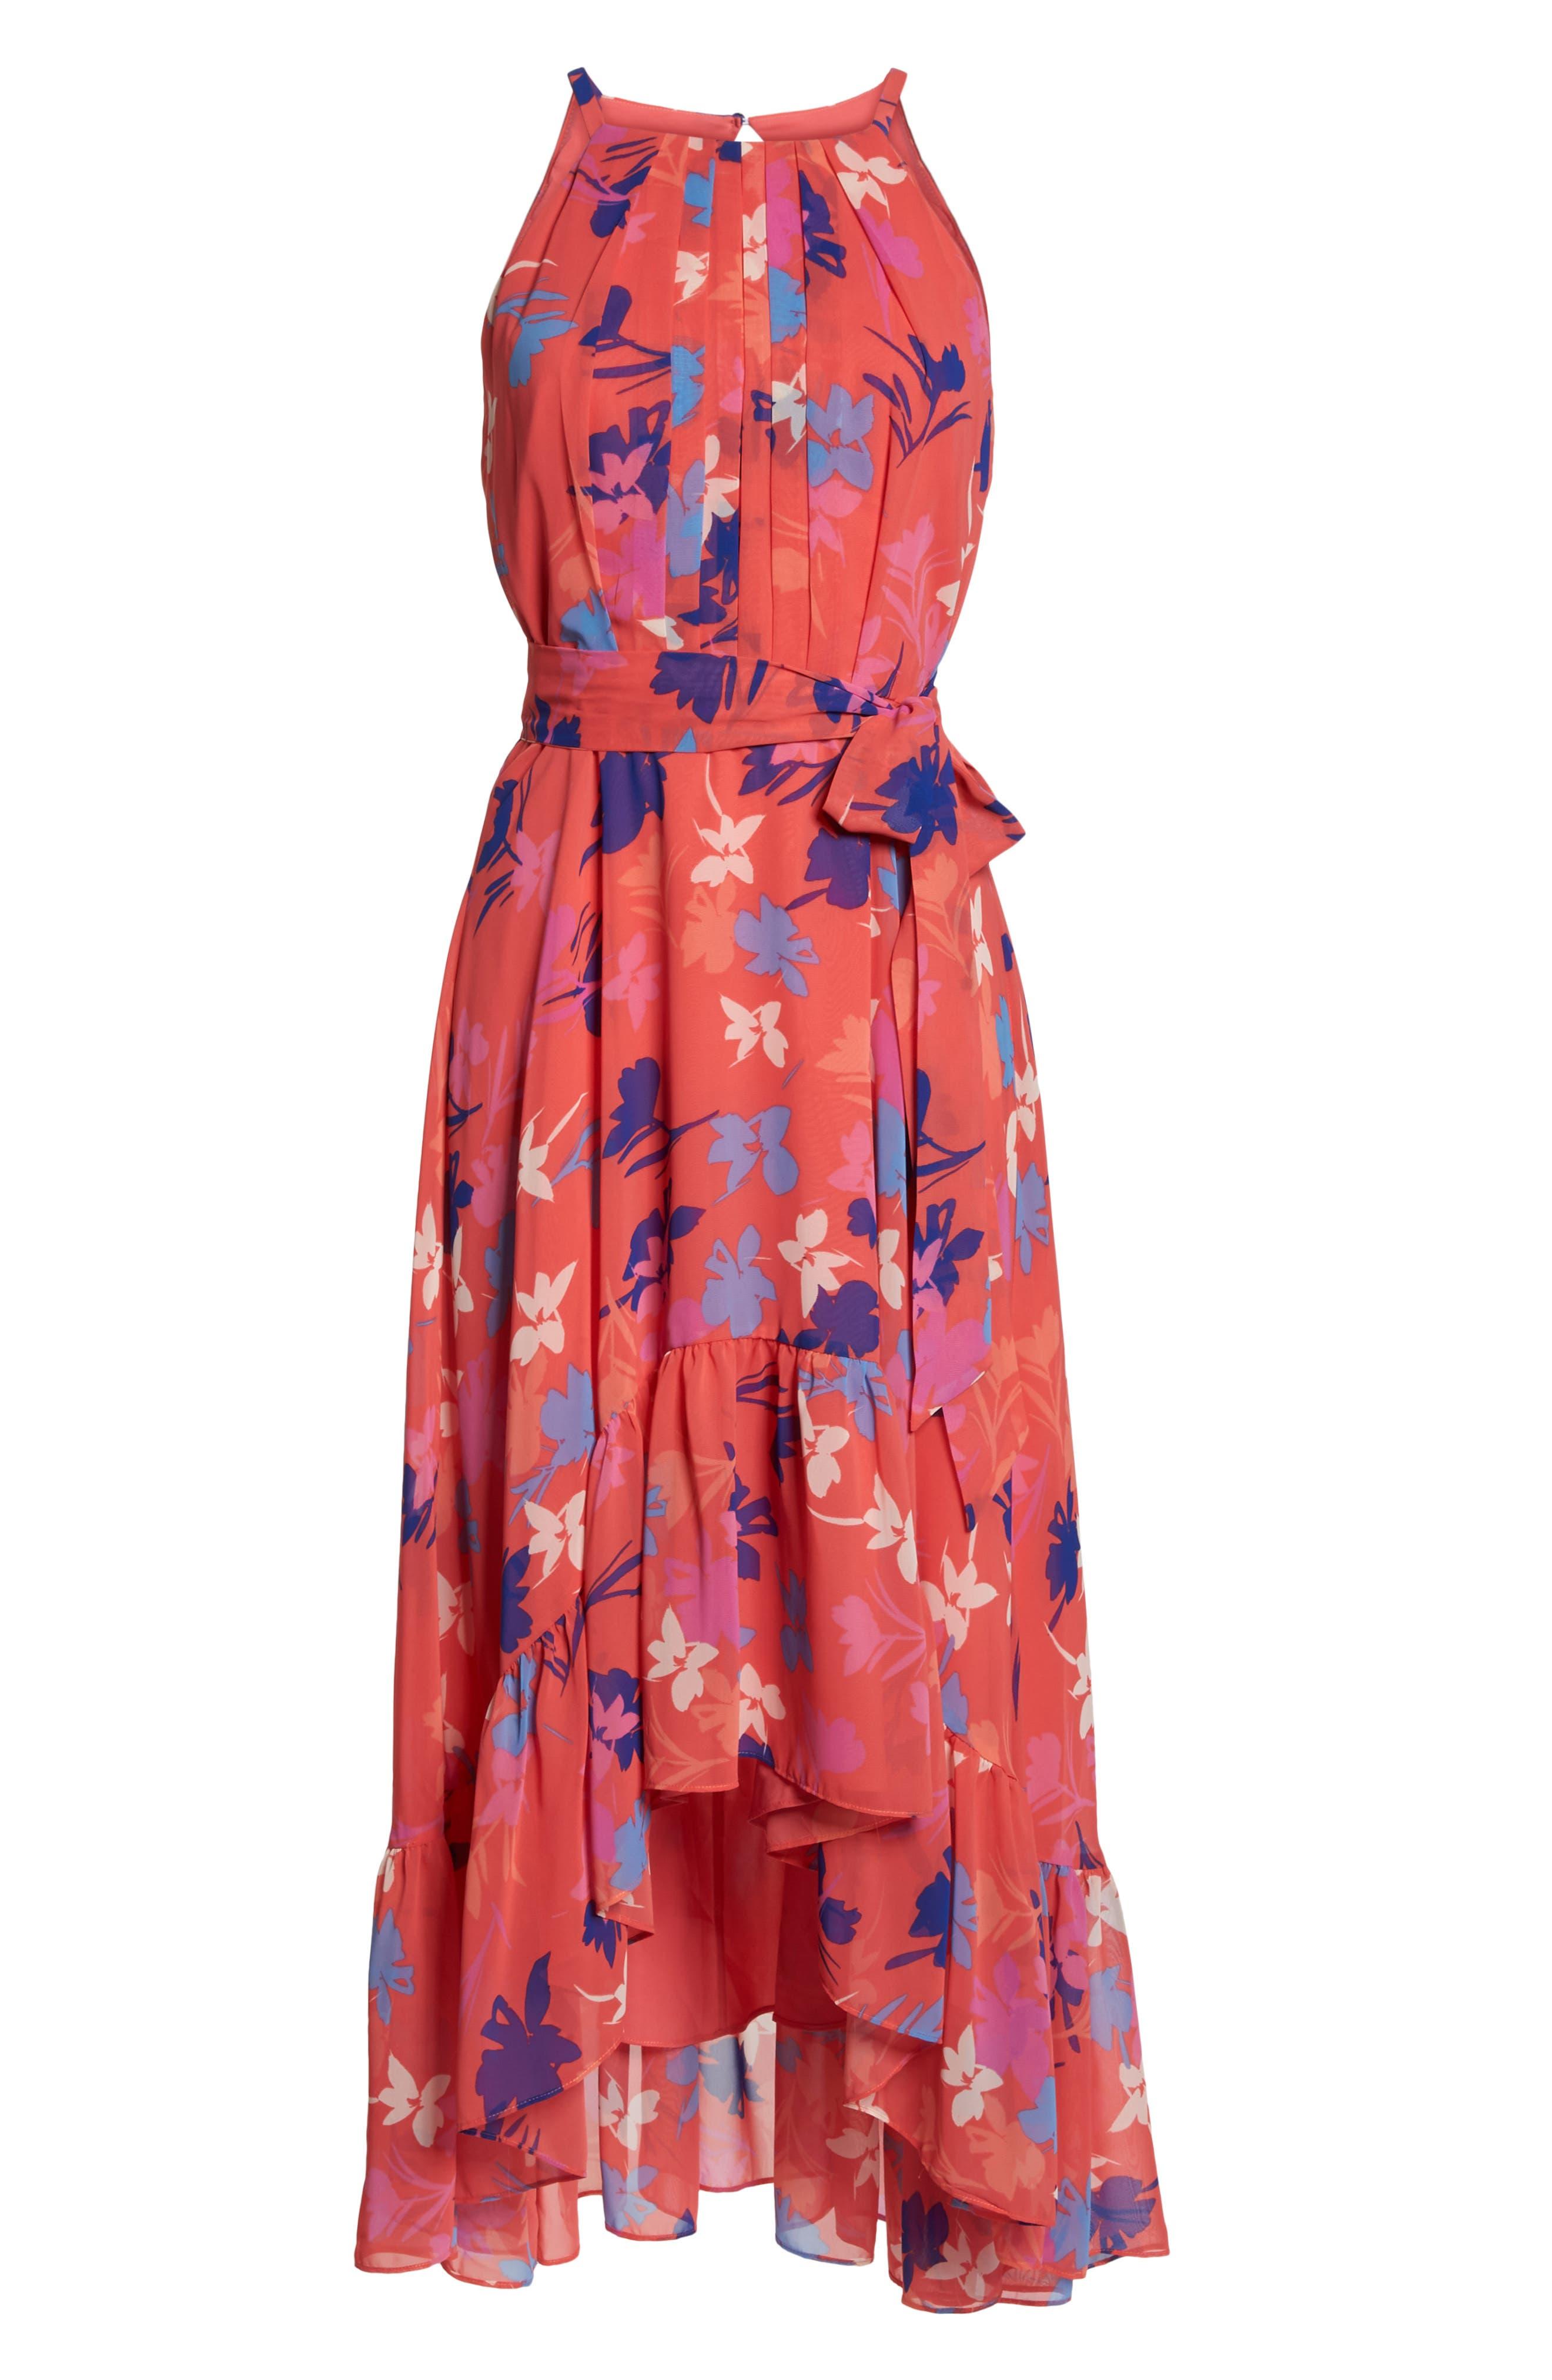 Floral High/Low Chiffon Halter Dress,                             Alternate thumbnail 7, color,                             Coral